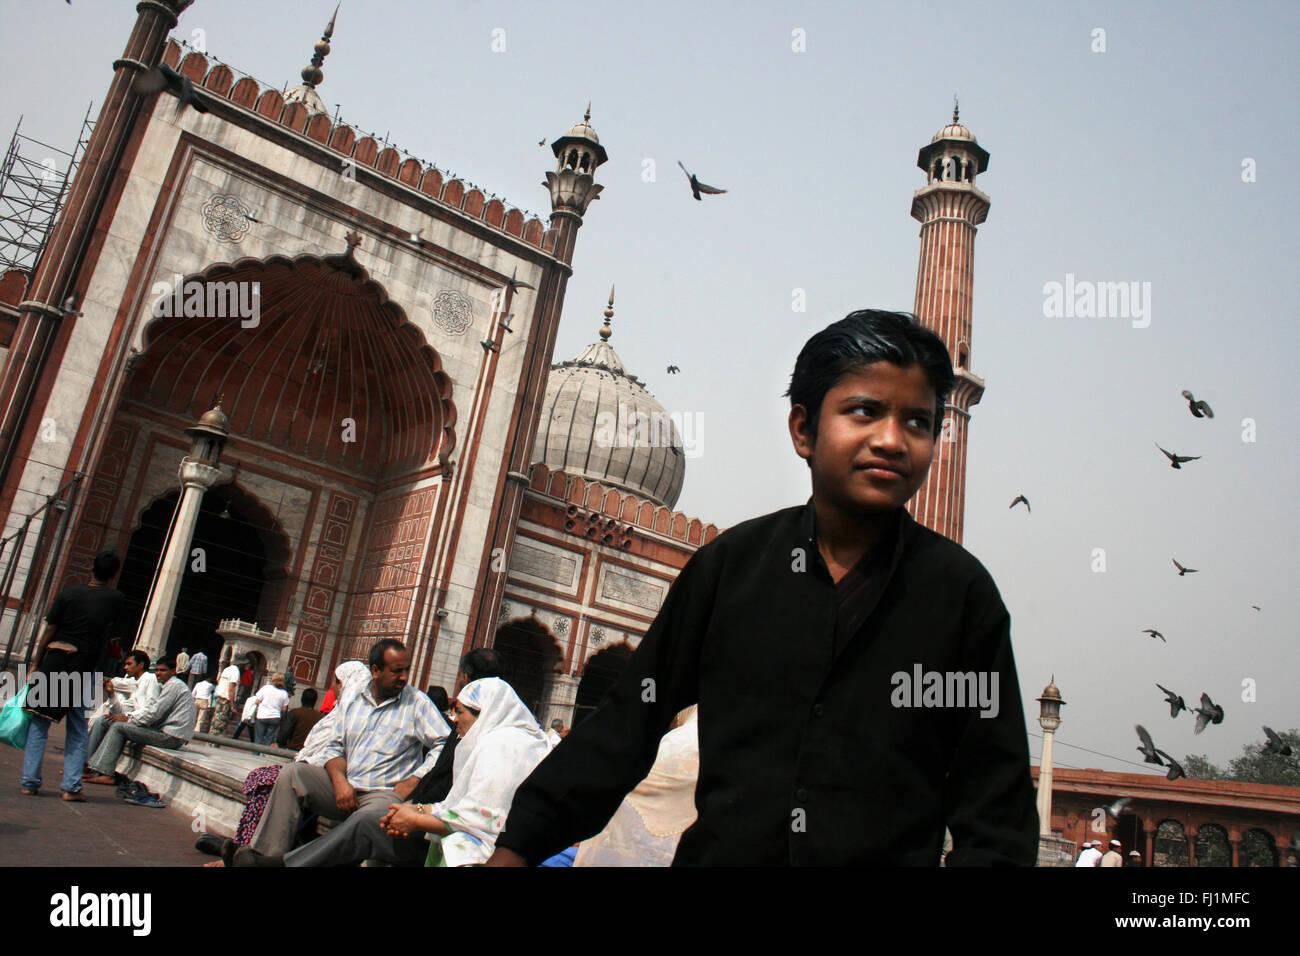 Muslims at Jama Masjid (great mosque) of Old Delhi , India - Stock Image